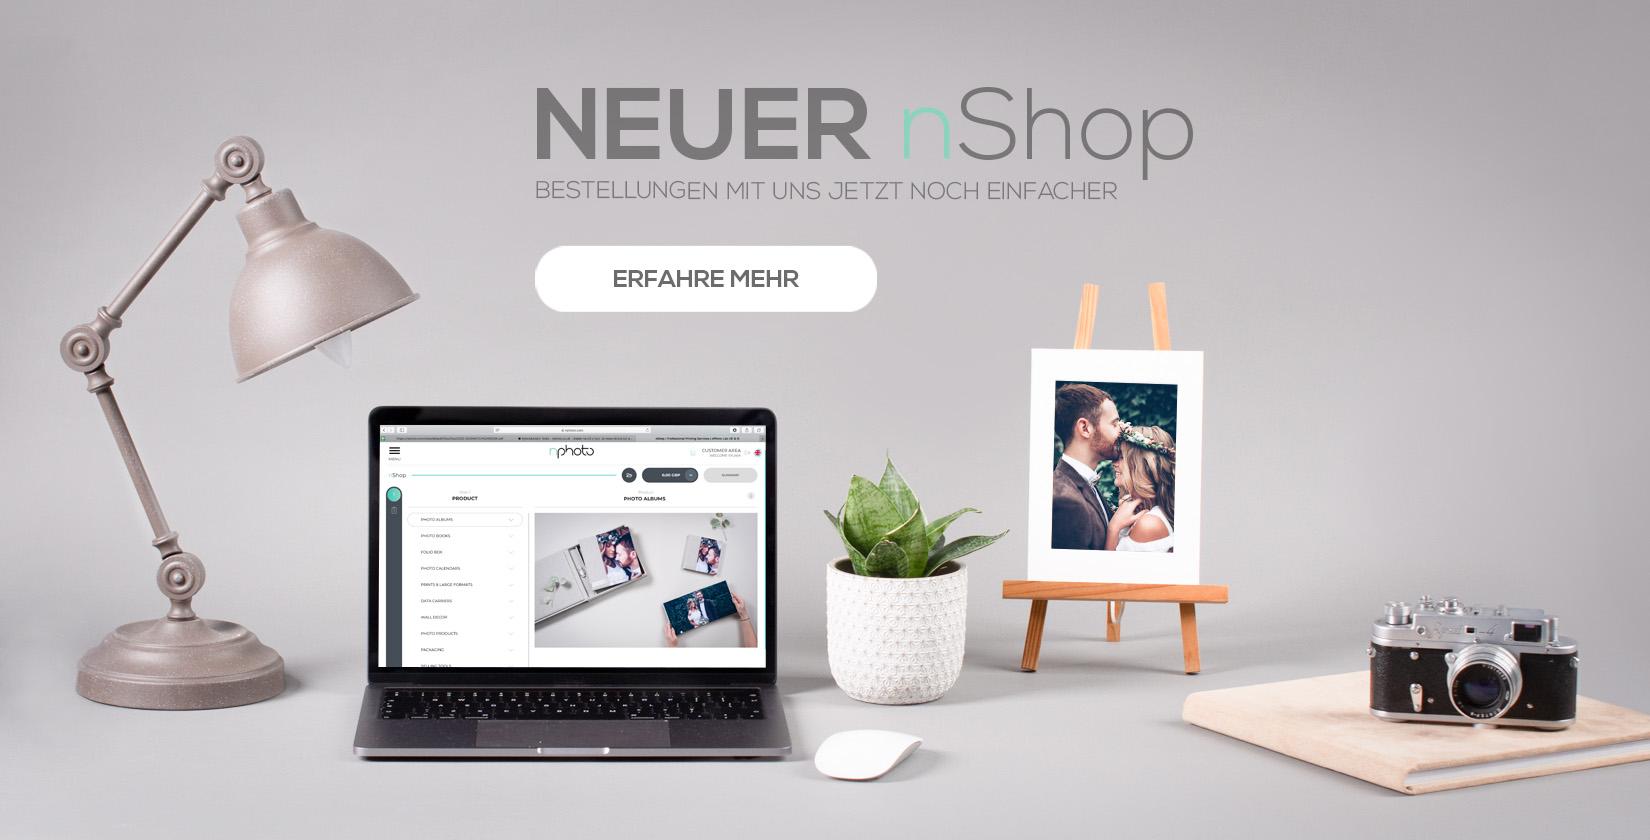 neuer nShop